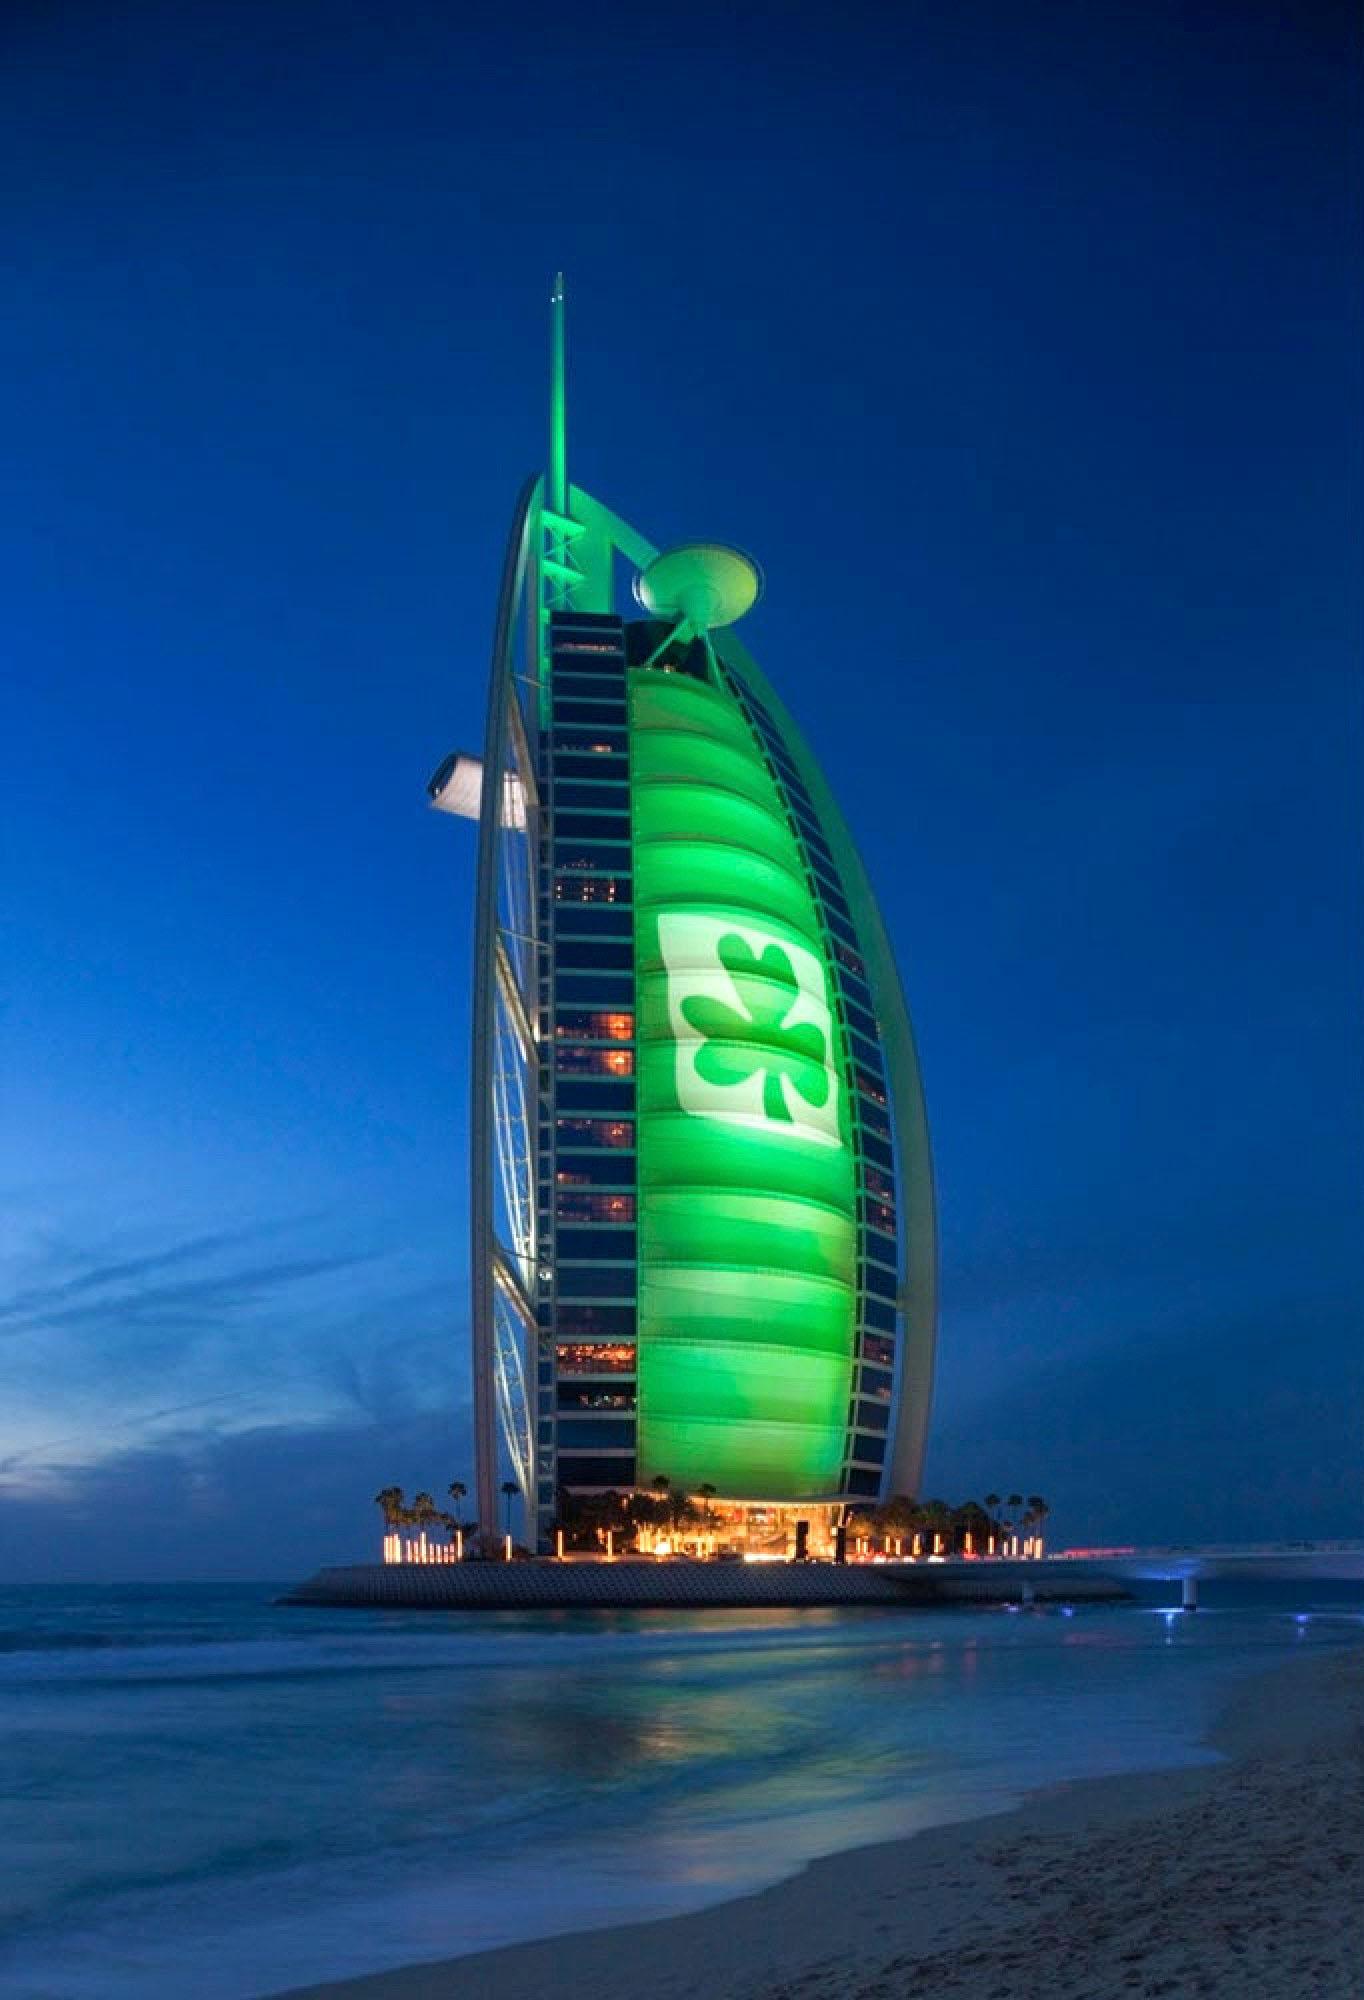 Burj al Arab Dubai - abends mit Beleuchtung